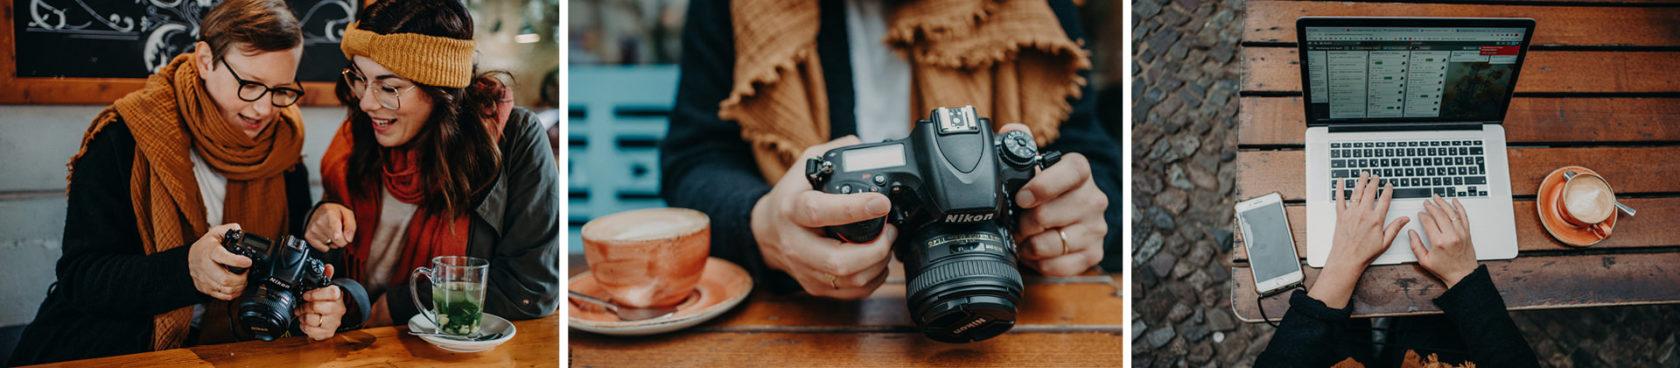 Onlinekurs Familienfotografie Kinderfotografie Kurs